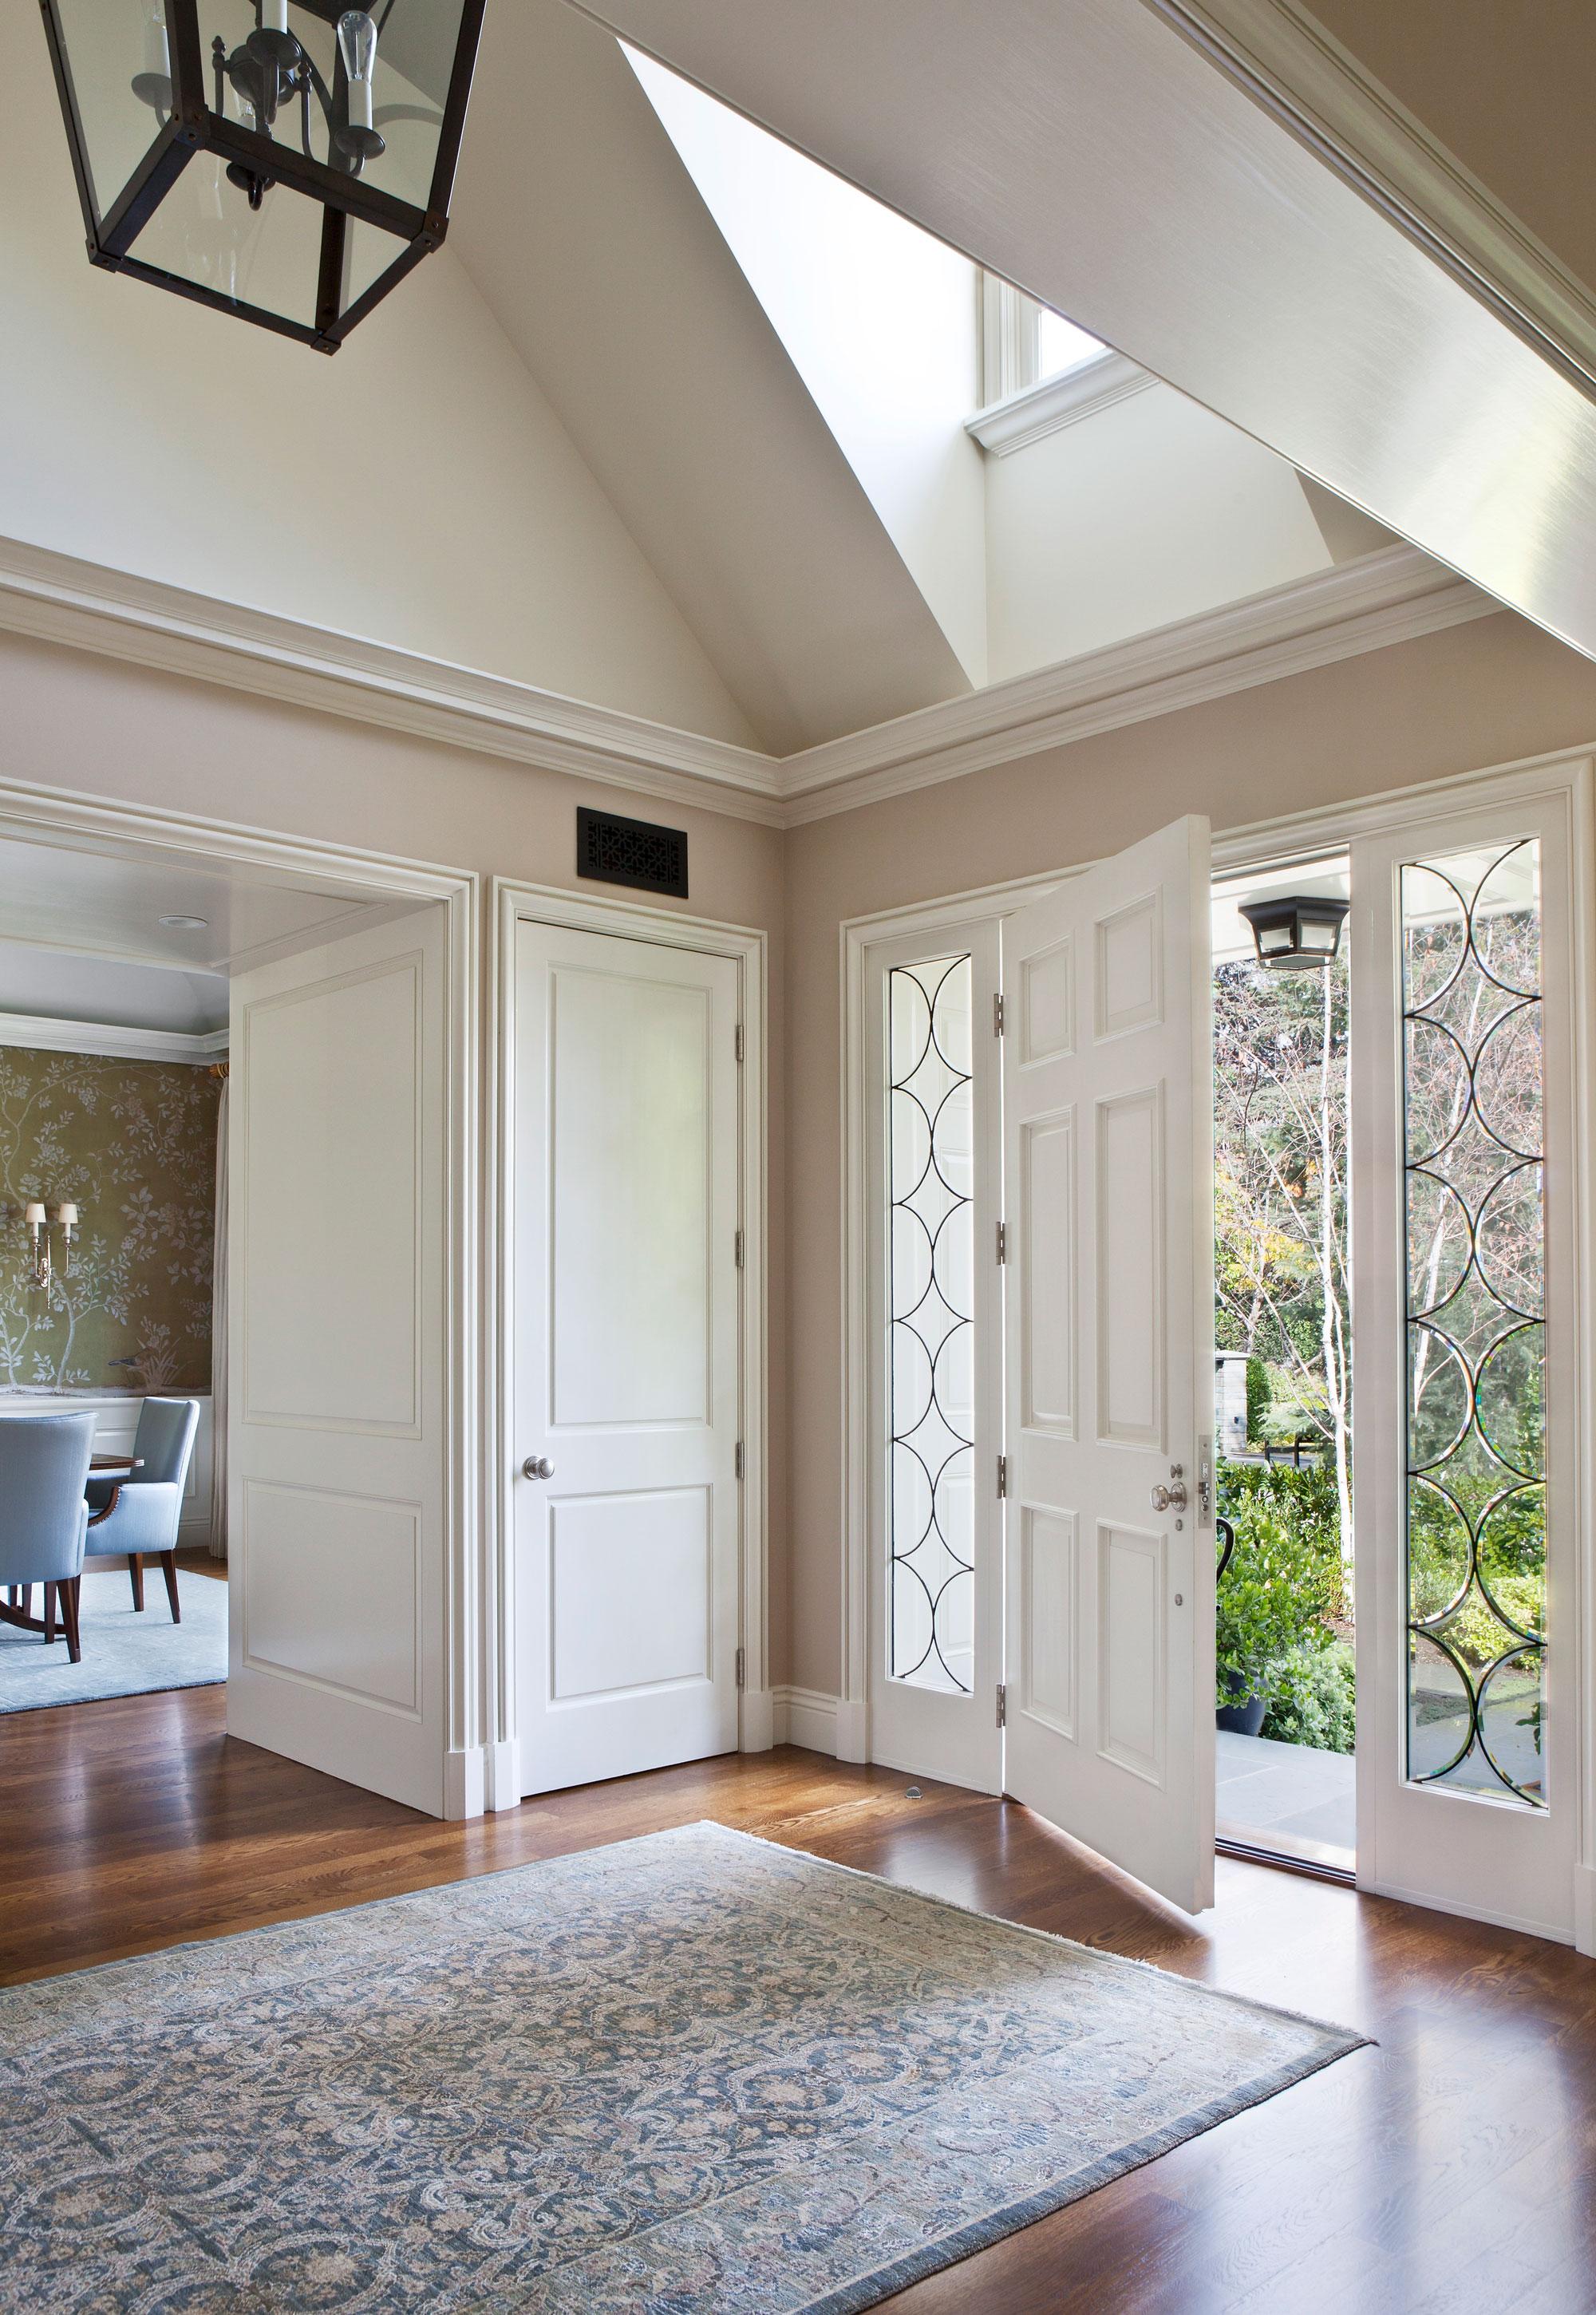 traditional-foyer-hardwood-floor-front-entry-ward-jewell.jpg